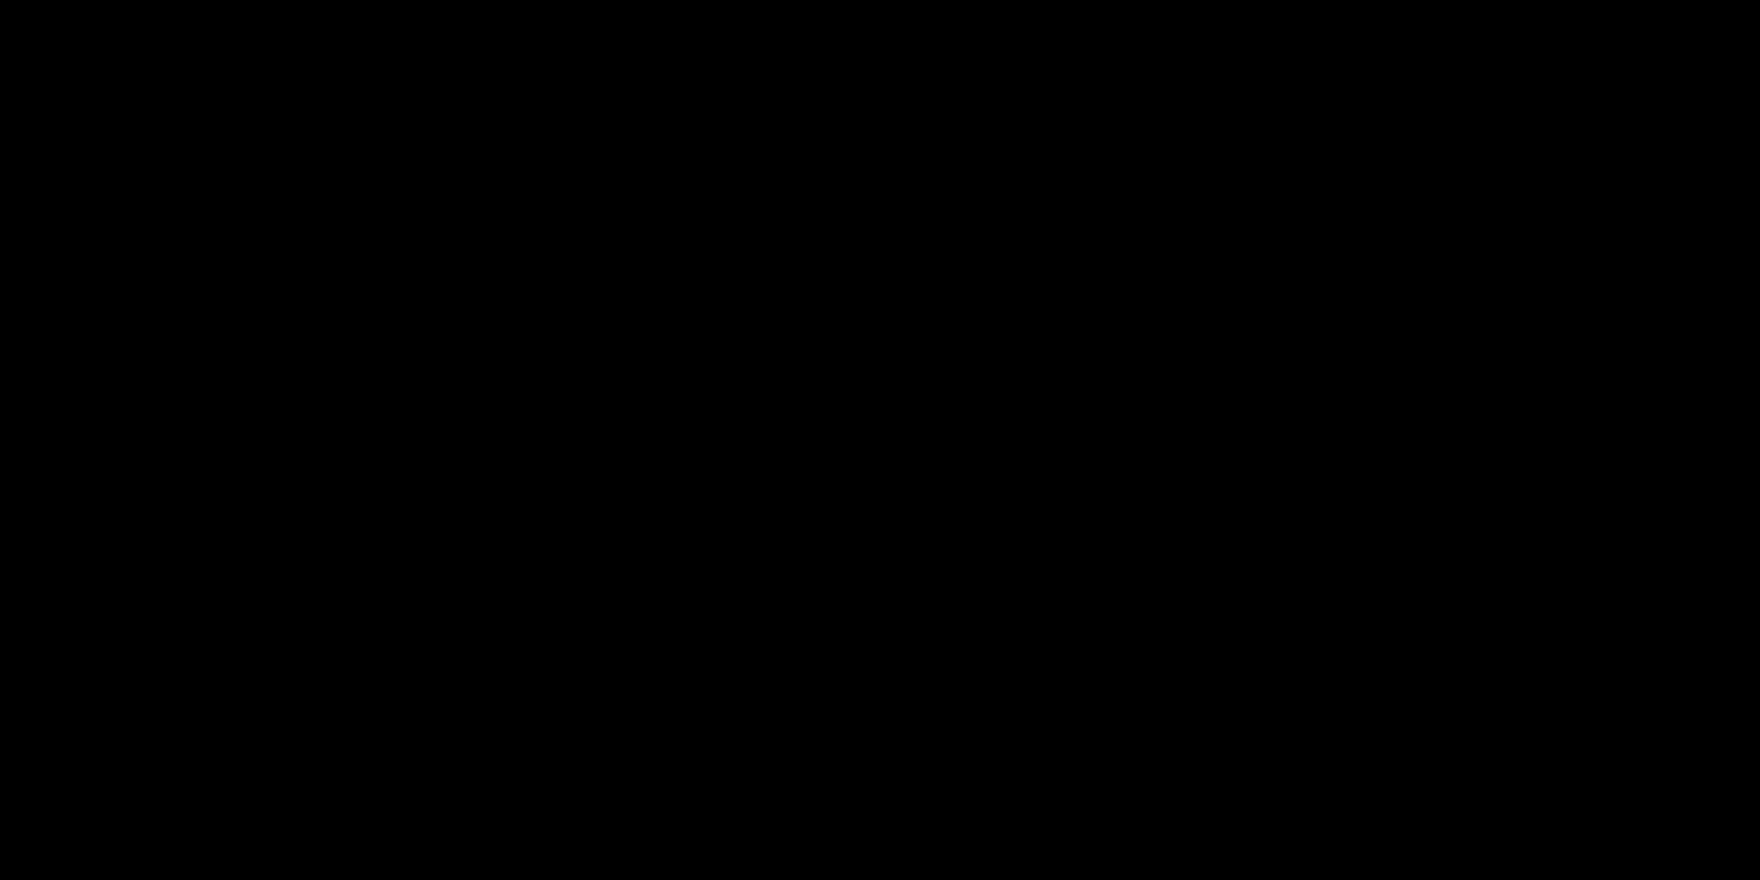 N-((3-(4-Iodophenyl)isoxazol-5-yl)methyl)-2-(diethylamino-d<sub>10</sub>)ethanamide